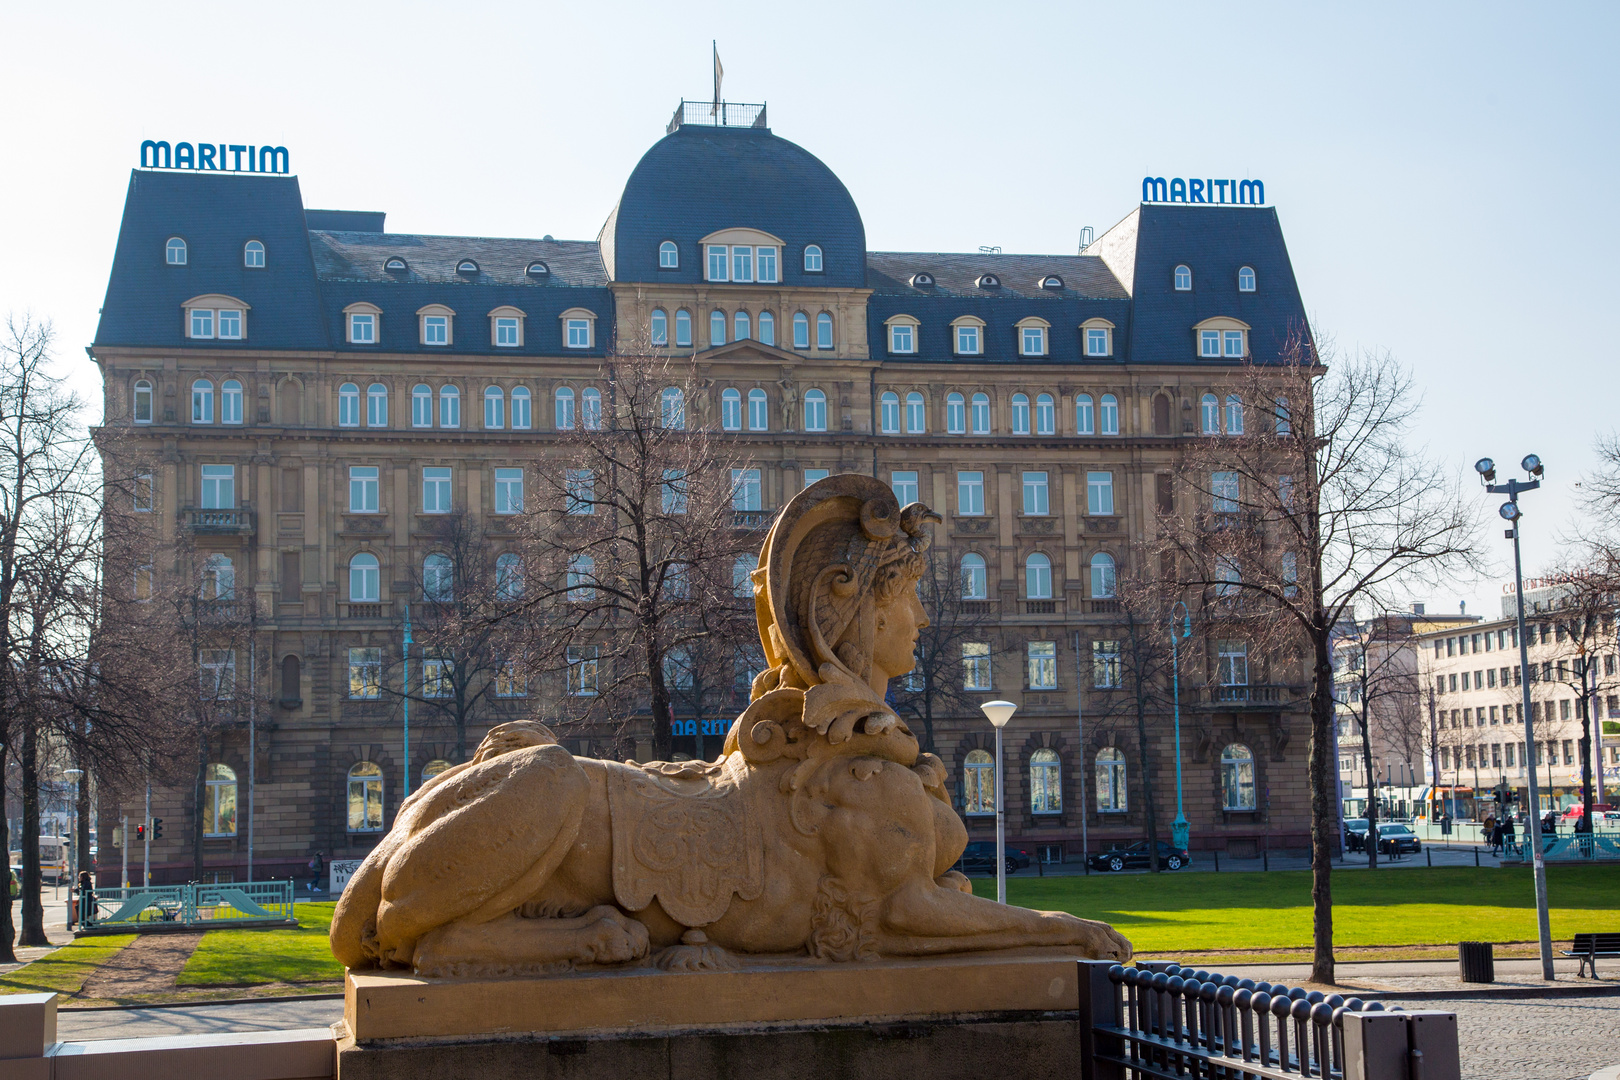 Mannheim - Maritim Hotel